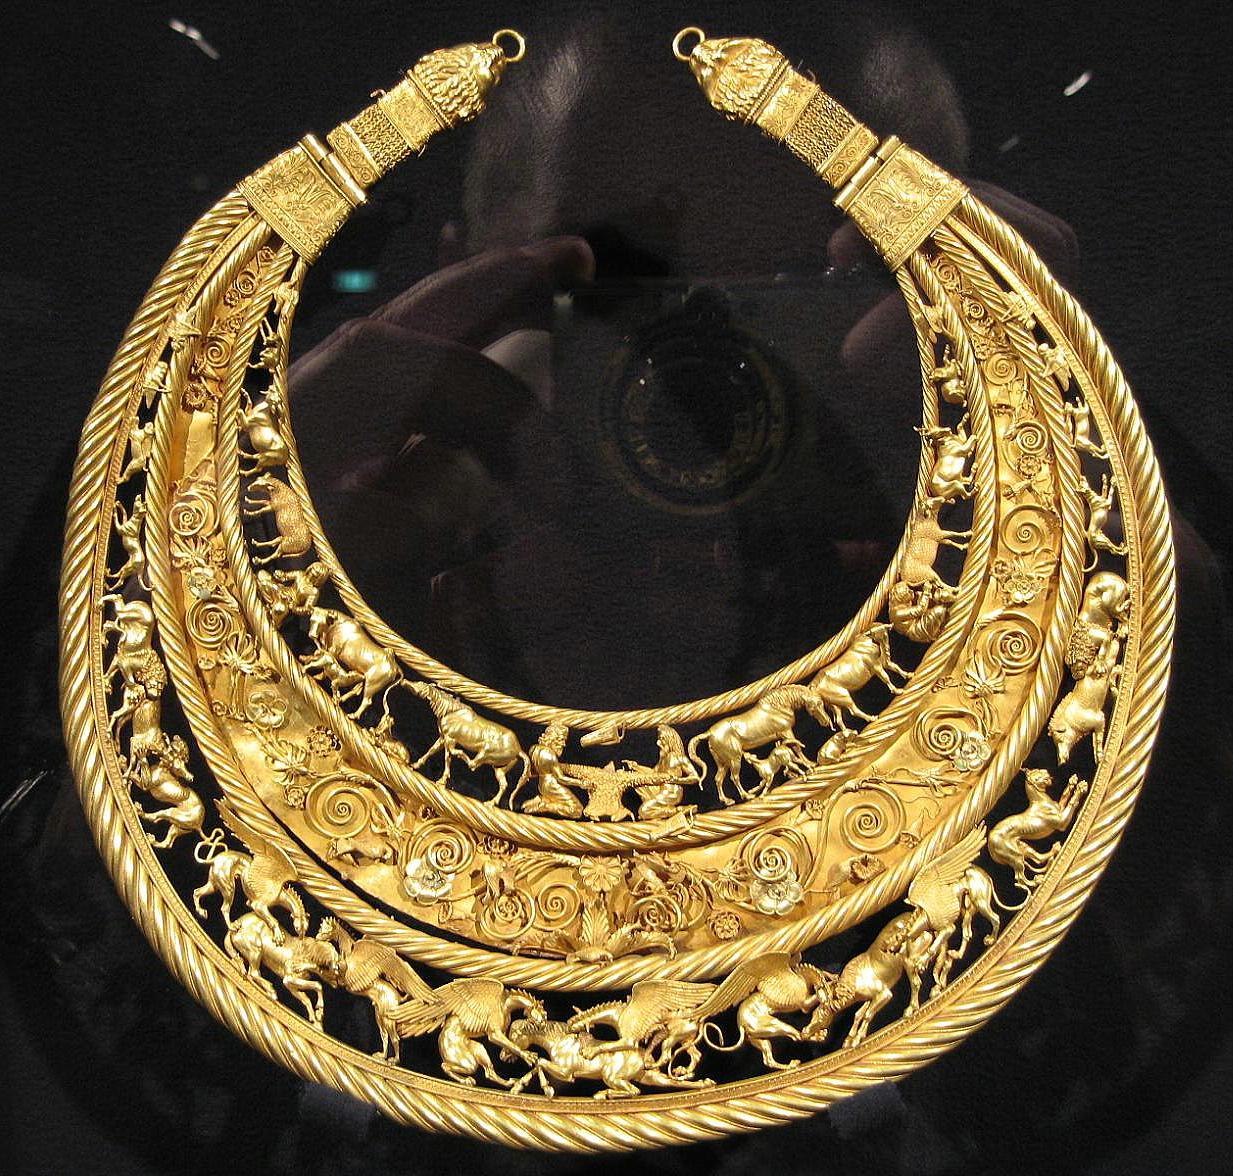 Scythian necklace